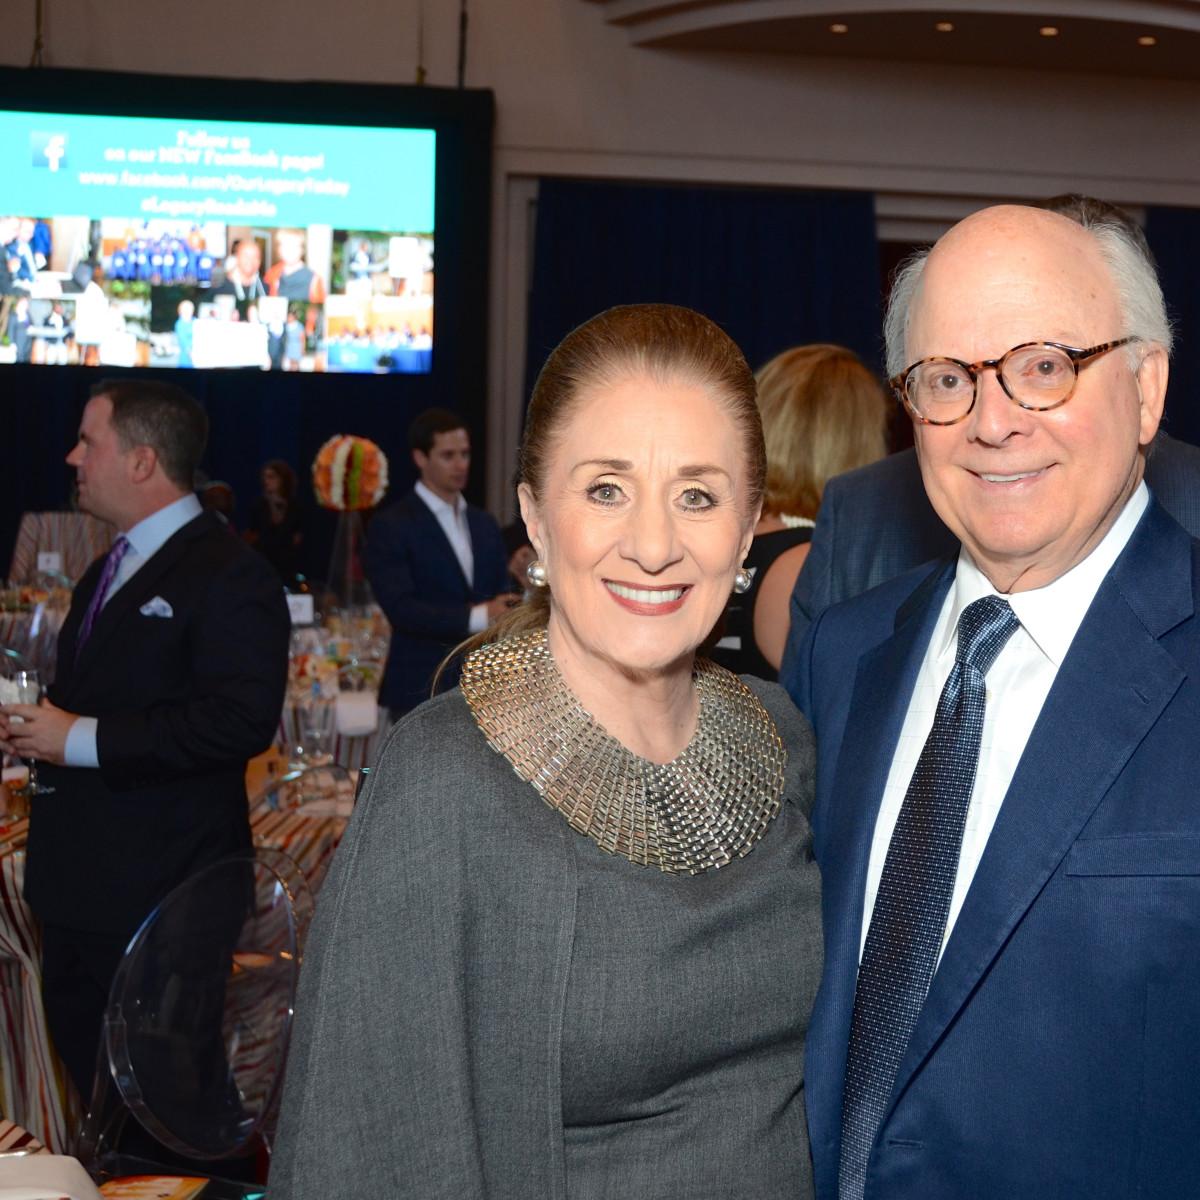 News, shelby, Legacy luncheon, Sept. 2015, Martha Turner, Glenn Bauguss